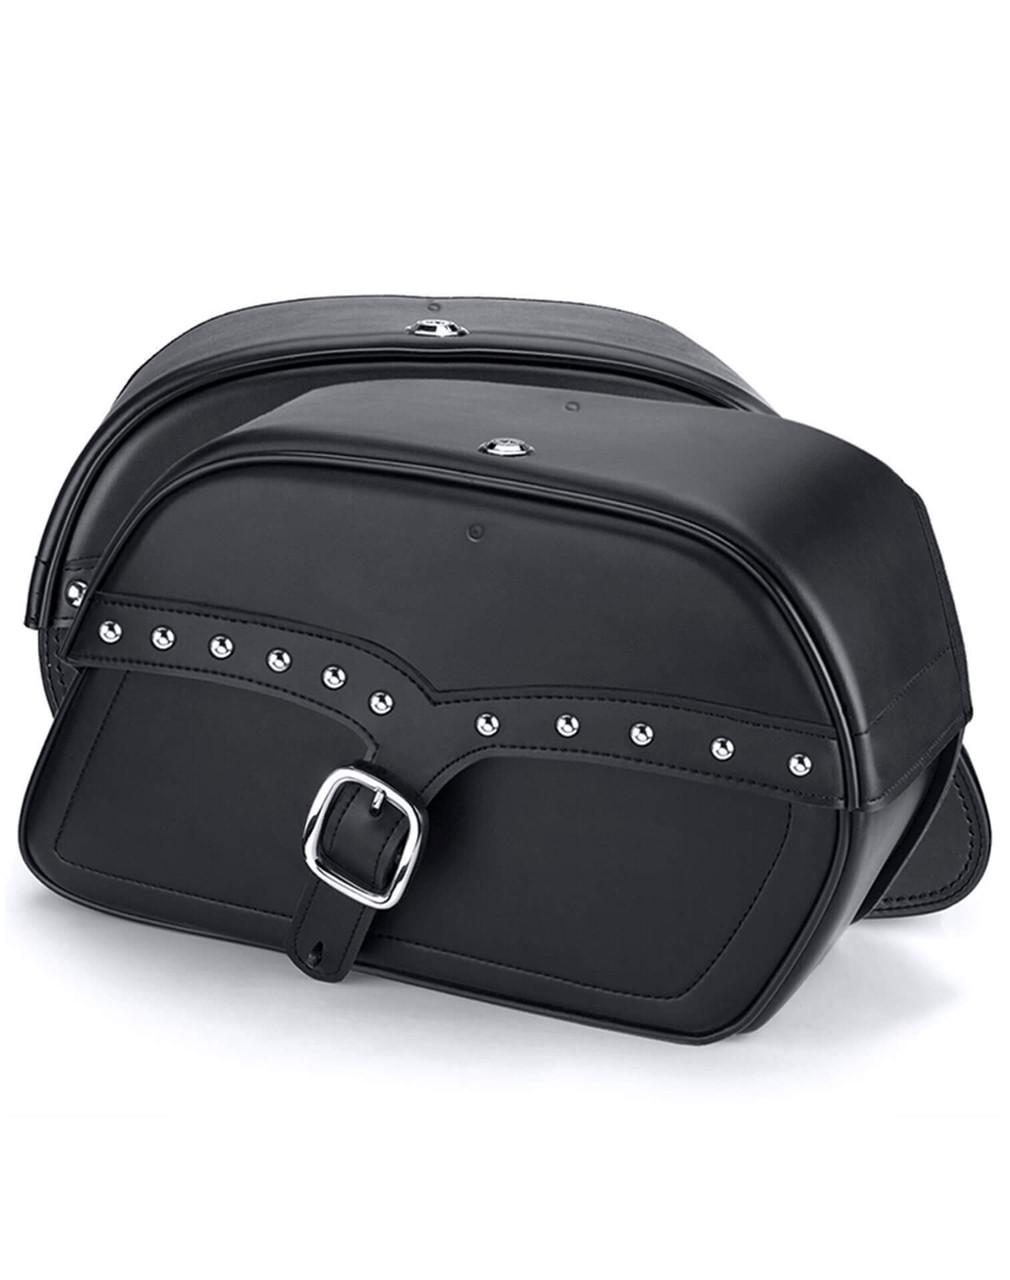 Honda 1100 Shadow Aero Charger Medium Single Strap Studded Motorcycle Saddlebags Both Bags View